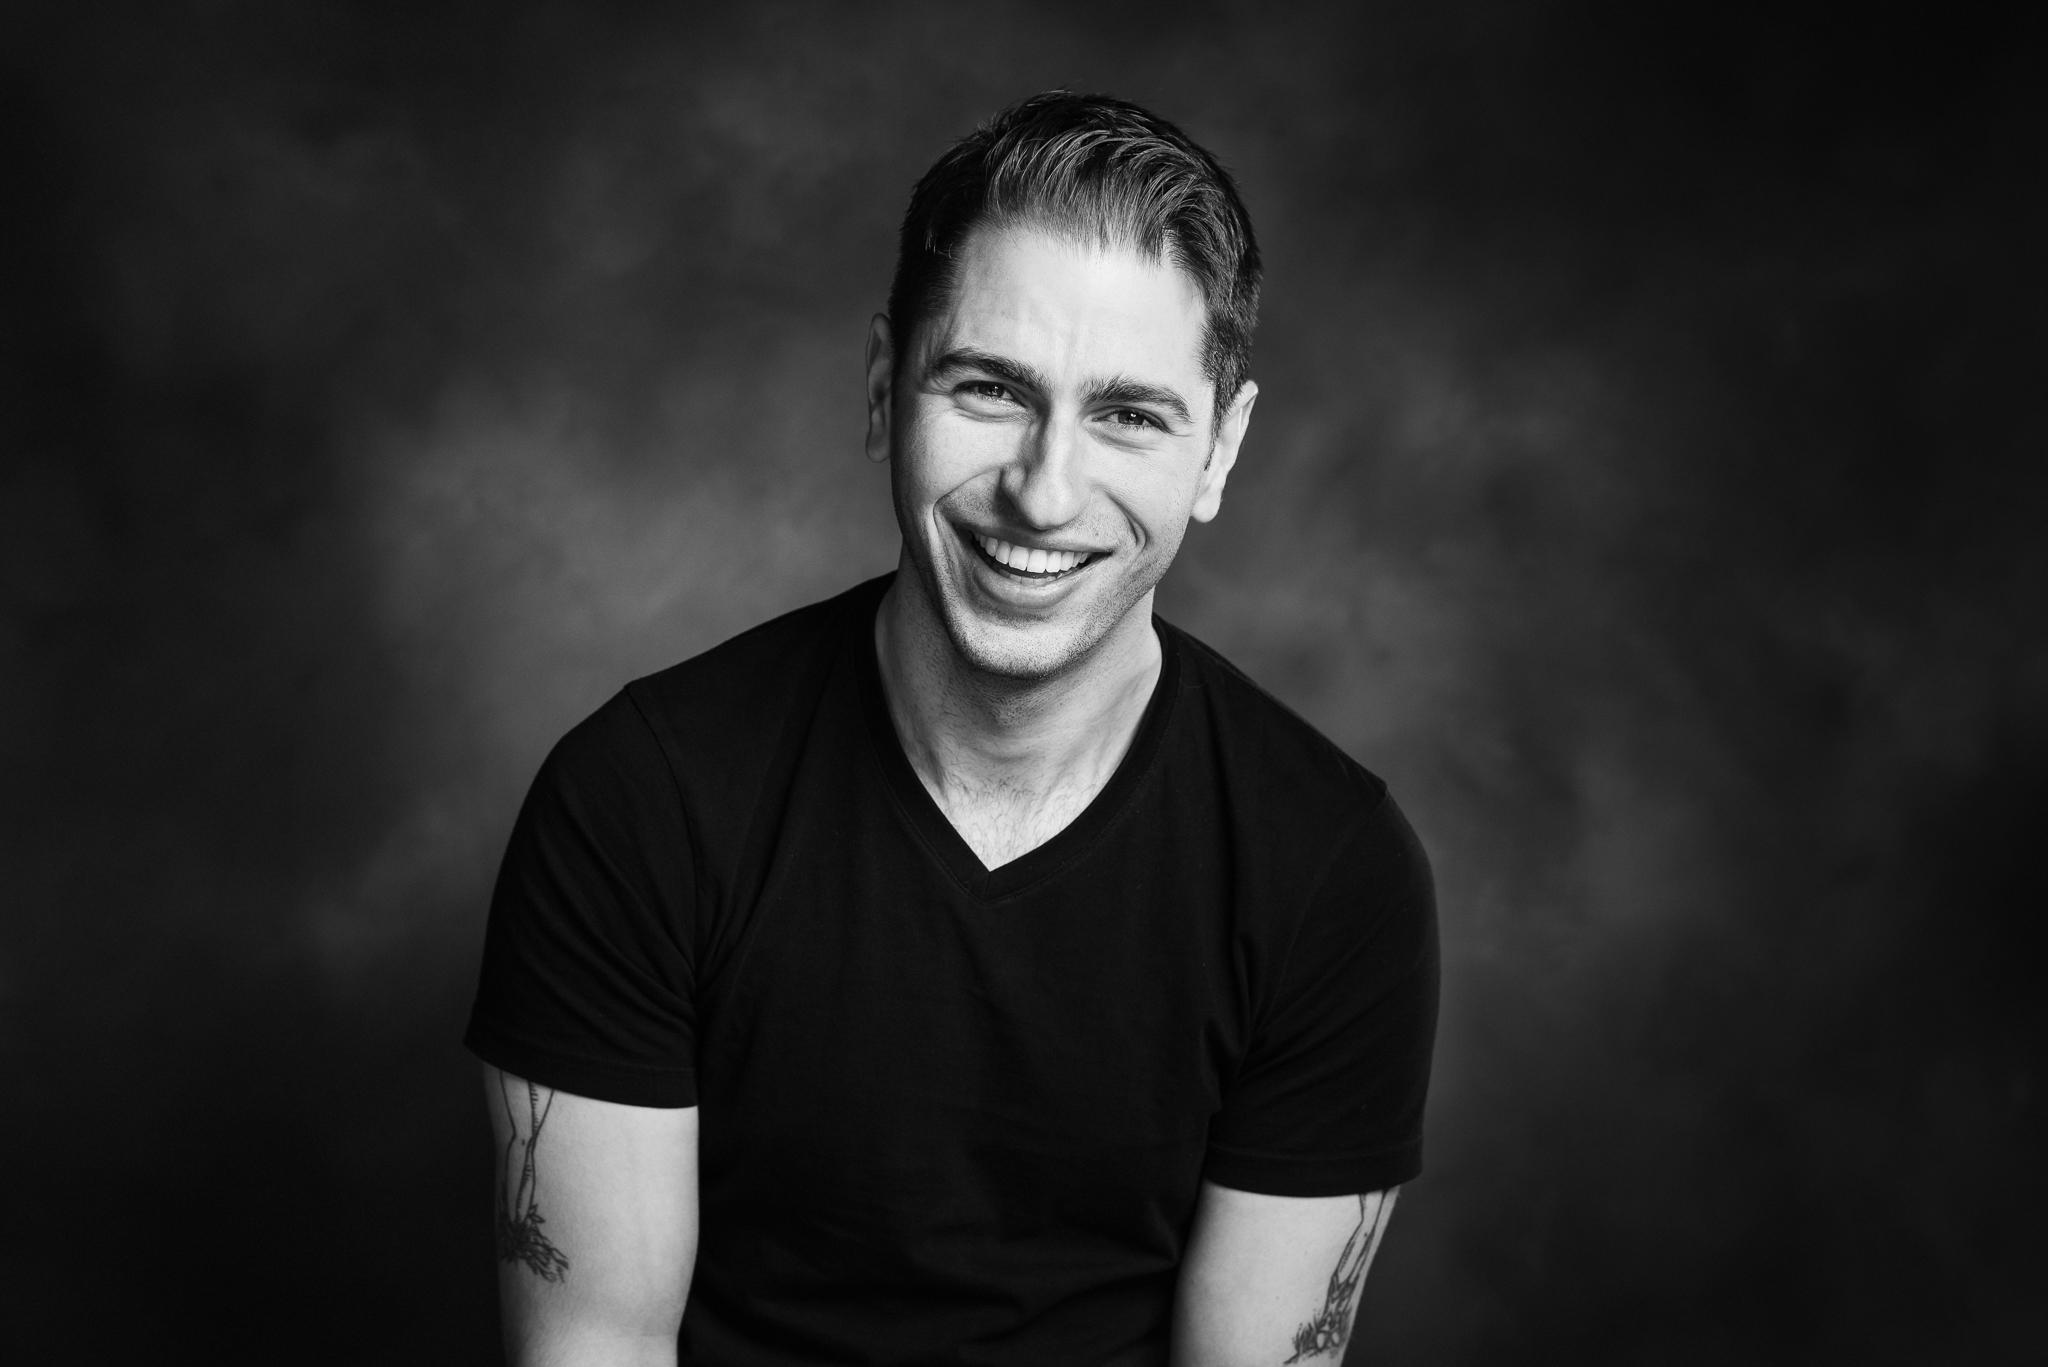 Photographer and photo booth genius Jon Lemon of New York City